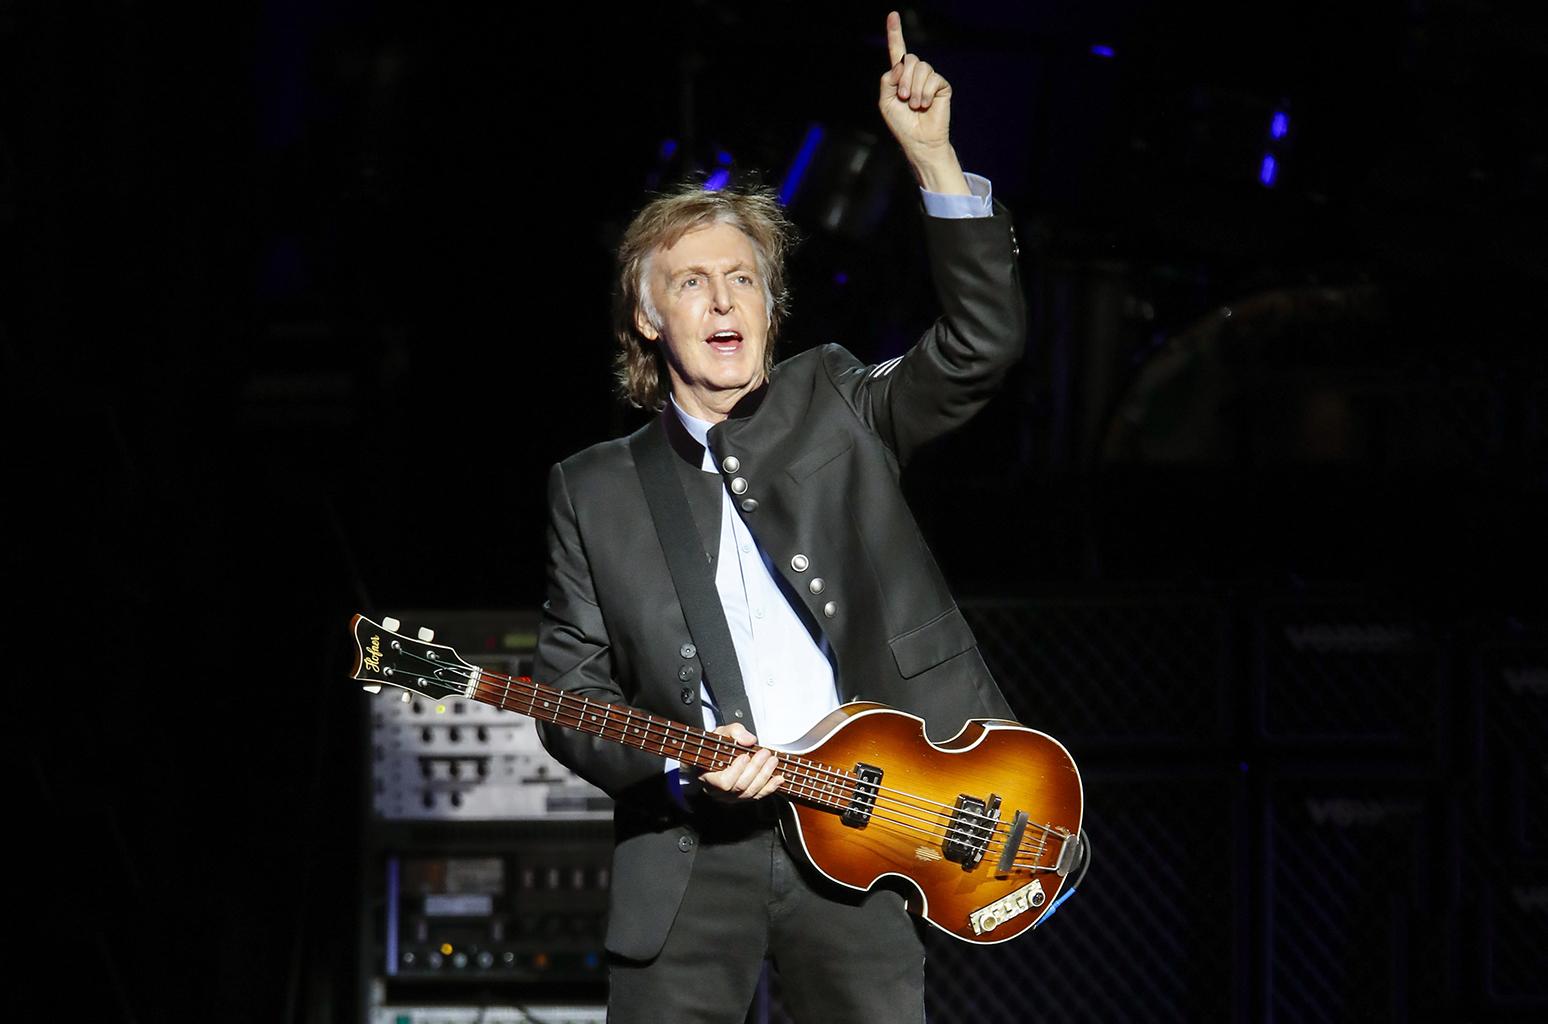 Paul McCartney Componer música da vergüenza